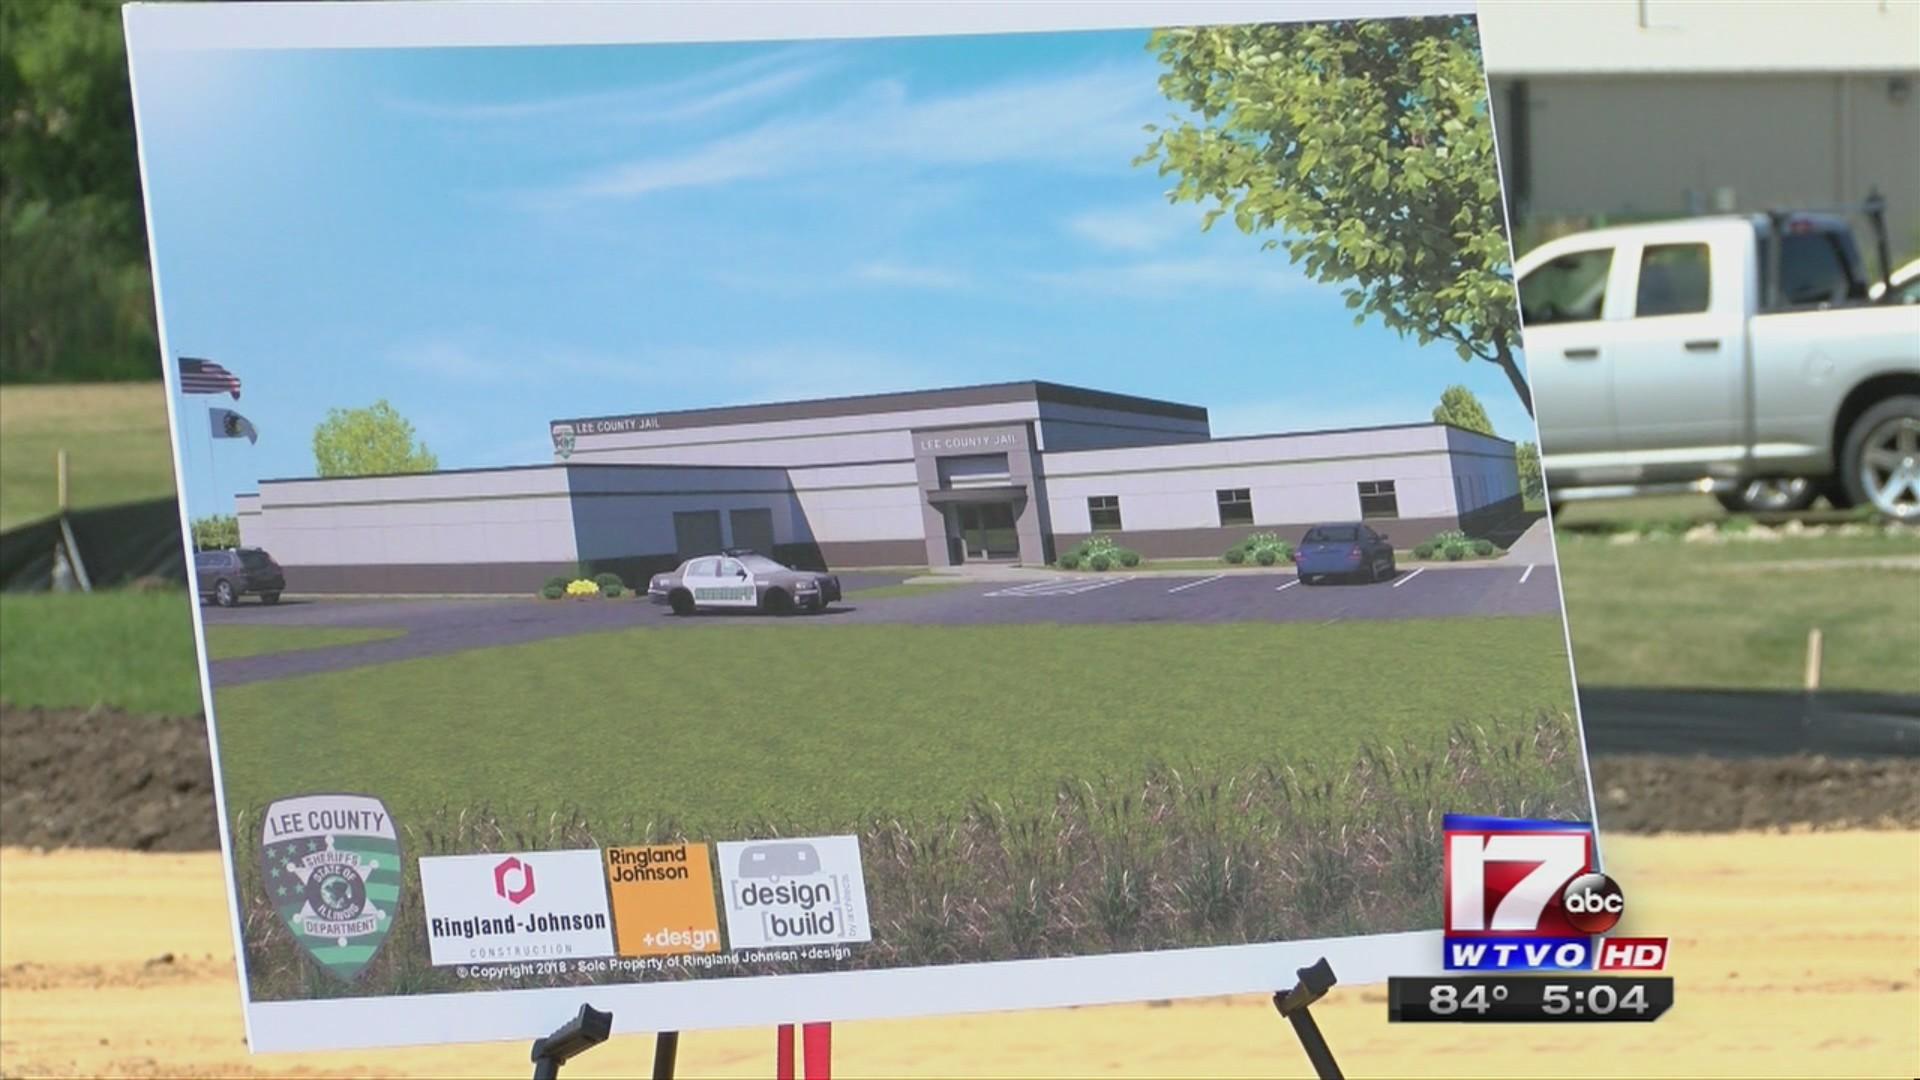 Construction begins on new, modernized Lee County Jail